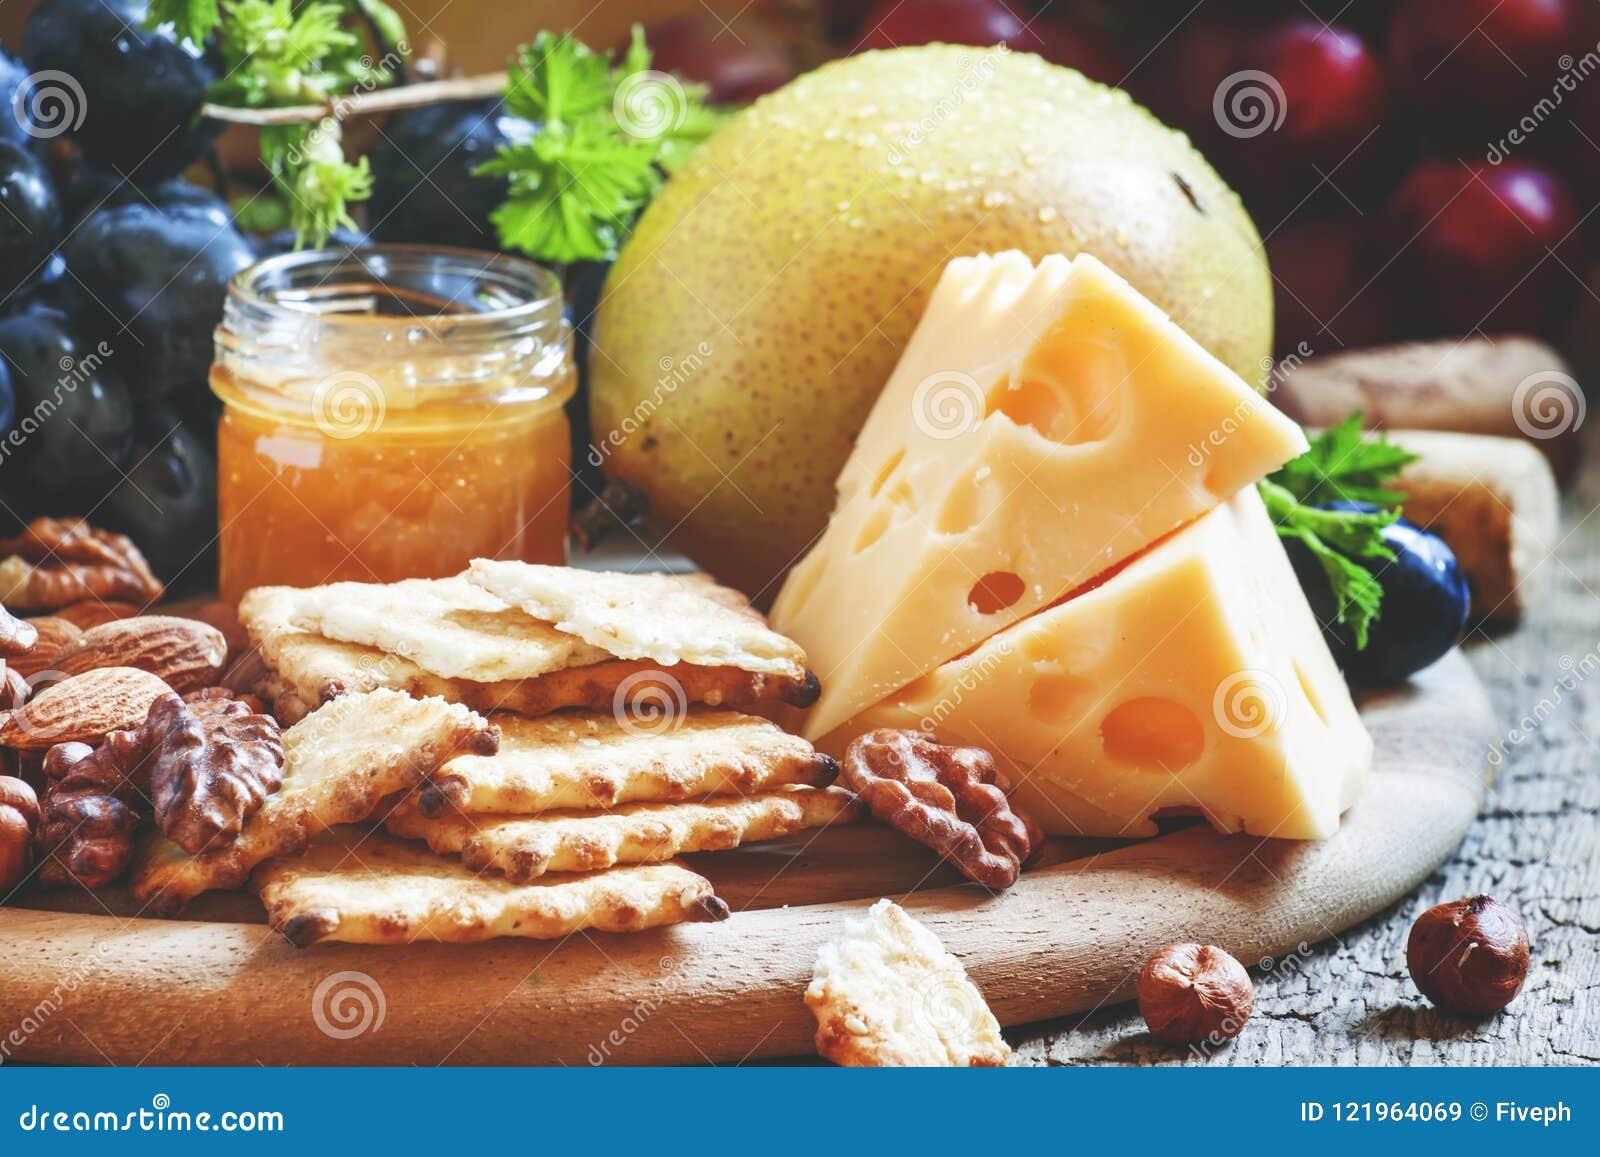 Snack plate:, walnuts, cheese food still life